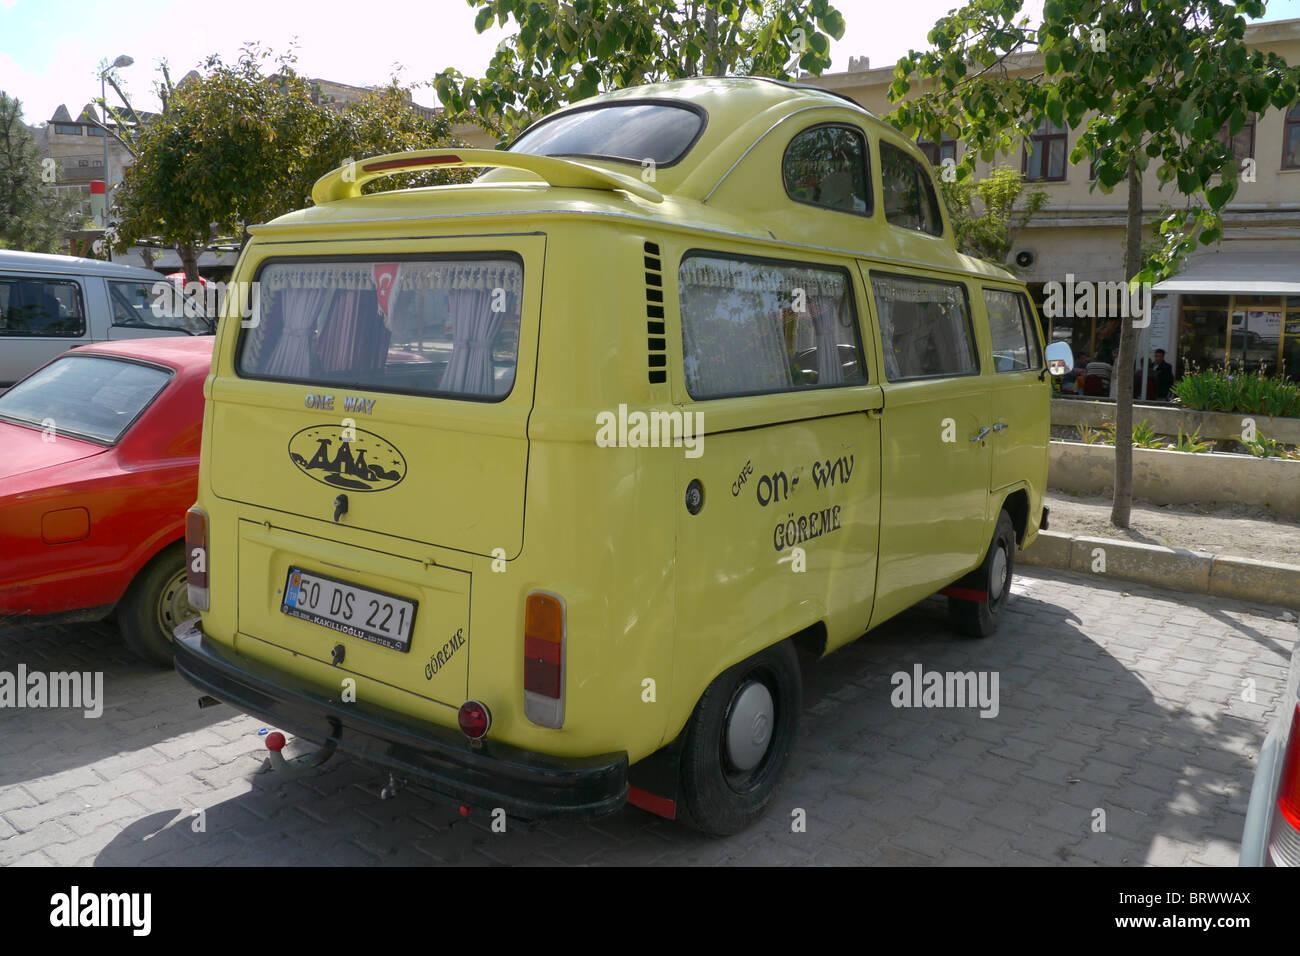 TURKEY VW camper and beetle combination, Goreme, Cappadocia. photo by Sean Sprague - Stock Image